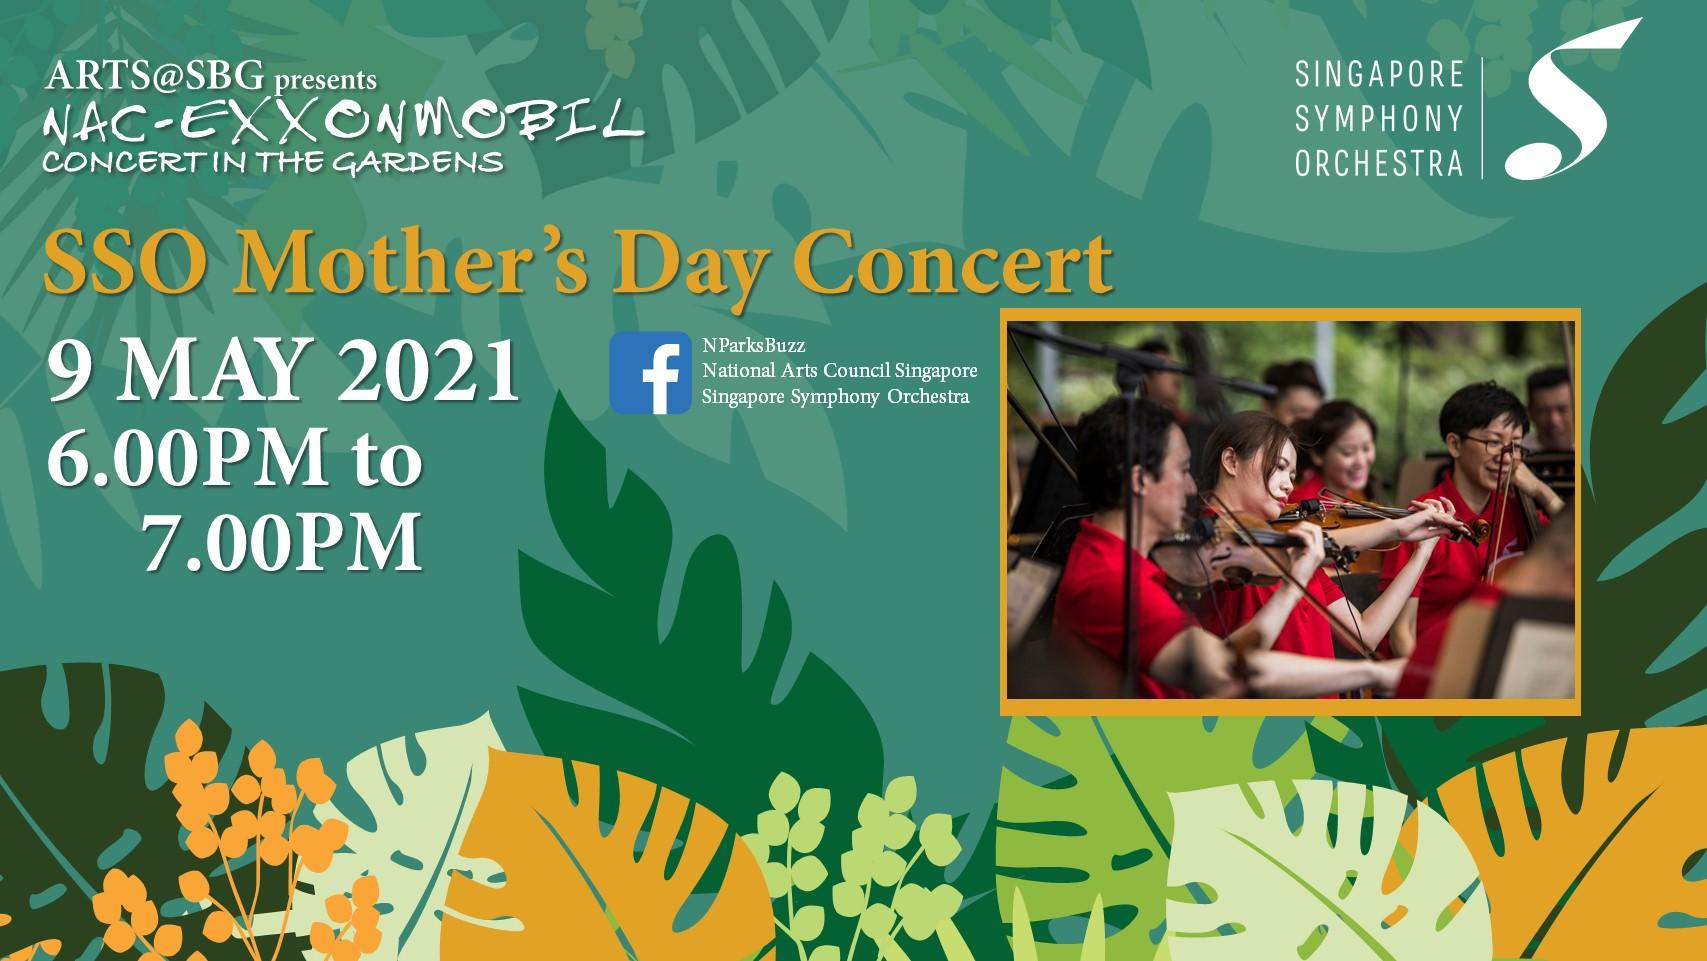 NAC-ExxonMobil Concert in the Park 2021